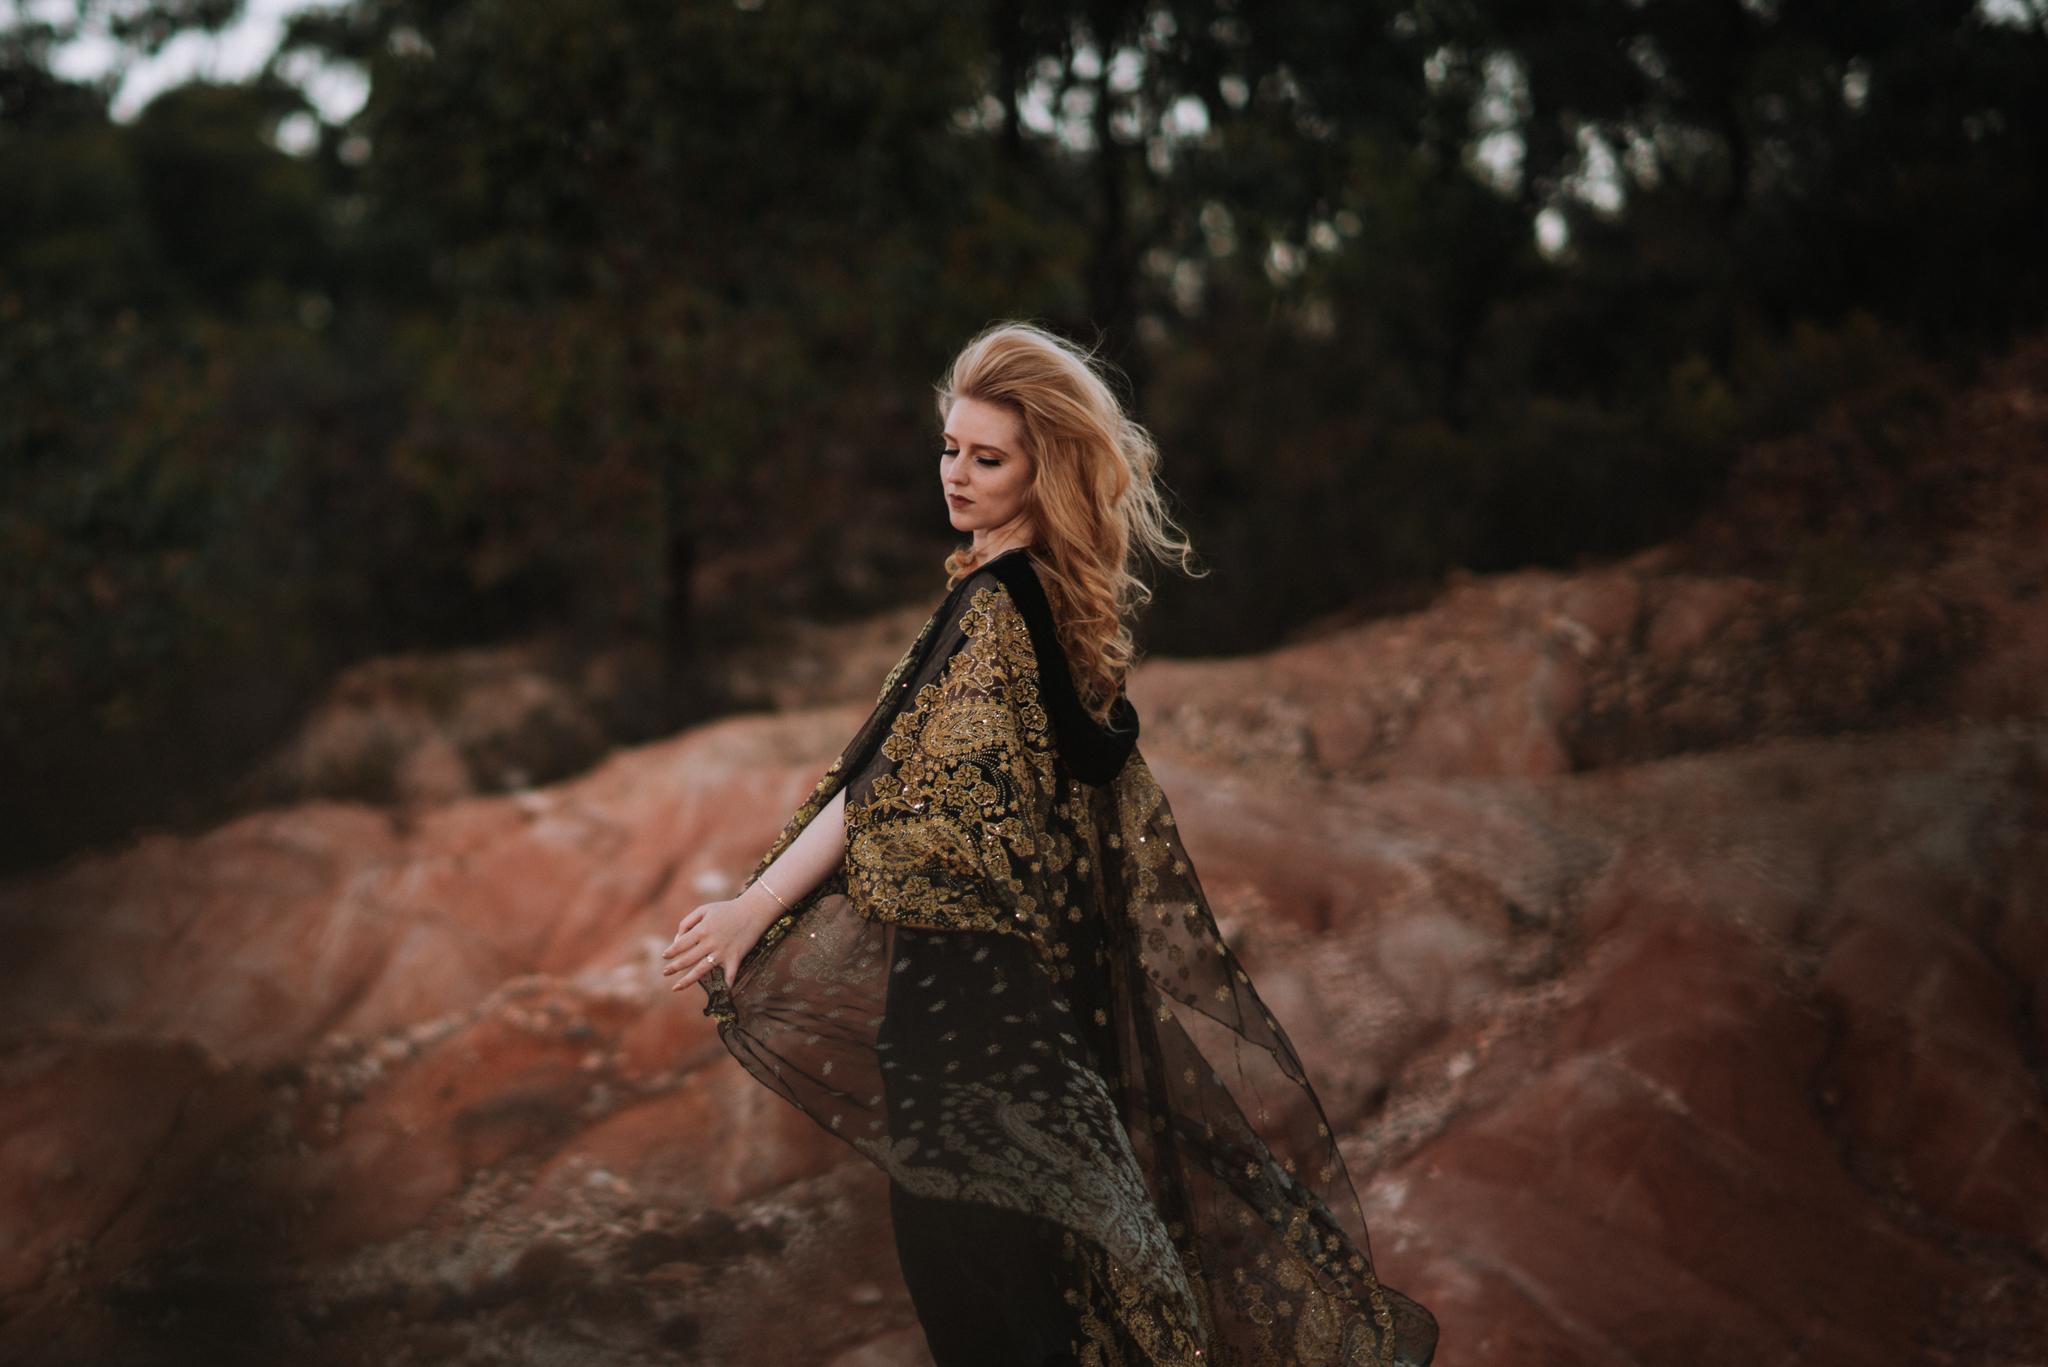 LOVELENSCAPES PHOTOGRAPHY • VISUAL POETRY • MELBOURNE WEDDING PHOTOGRAPHER • ALANNAH HILL DRESS • SUNSET ENGAGEMENT PHOTOS • PINK CLIFFS HEATHCOTE • FASHION EDITORIAL PHOTOGRAPHER • 28.jpg